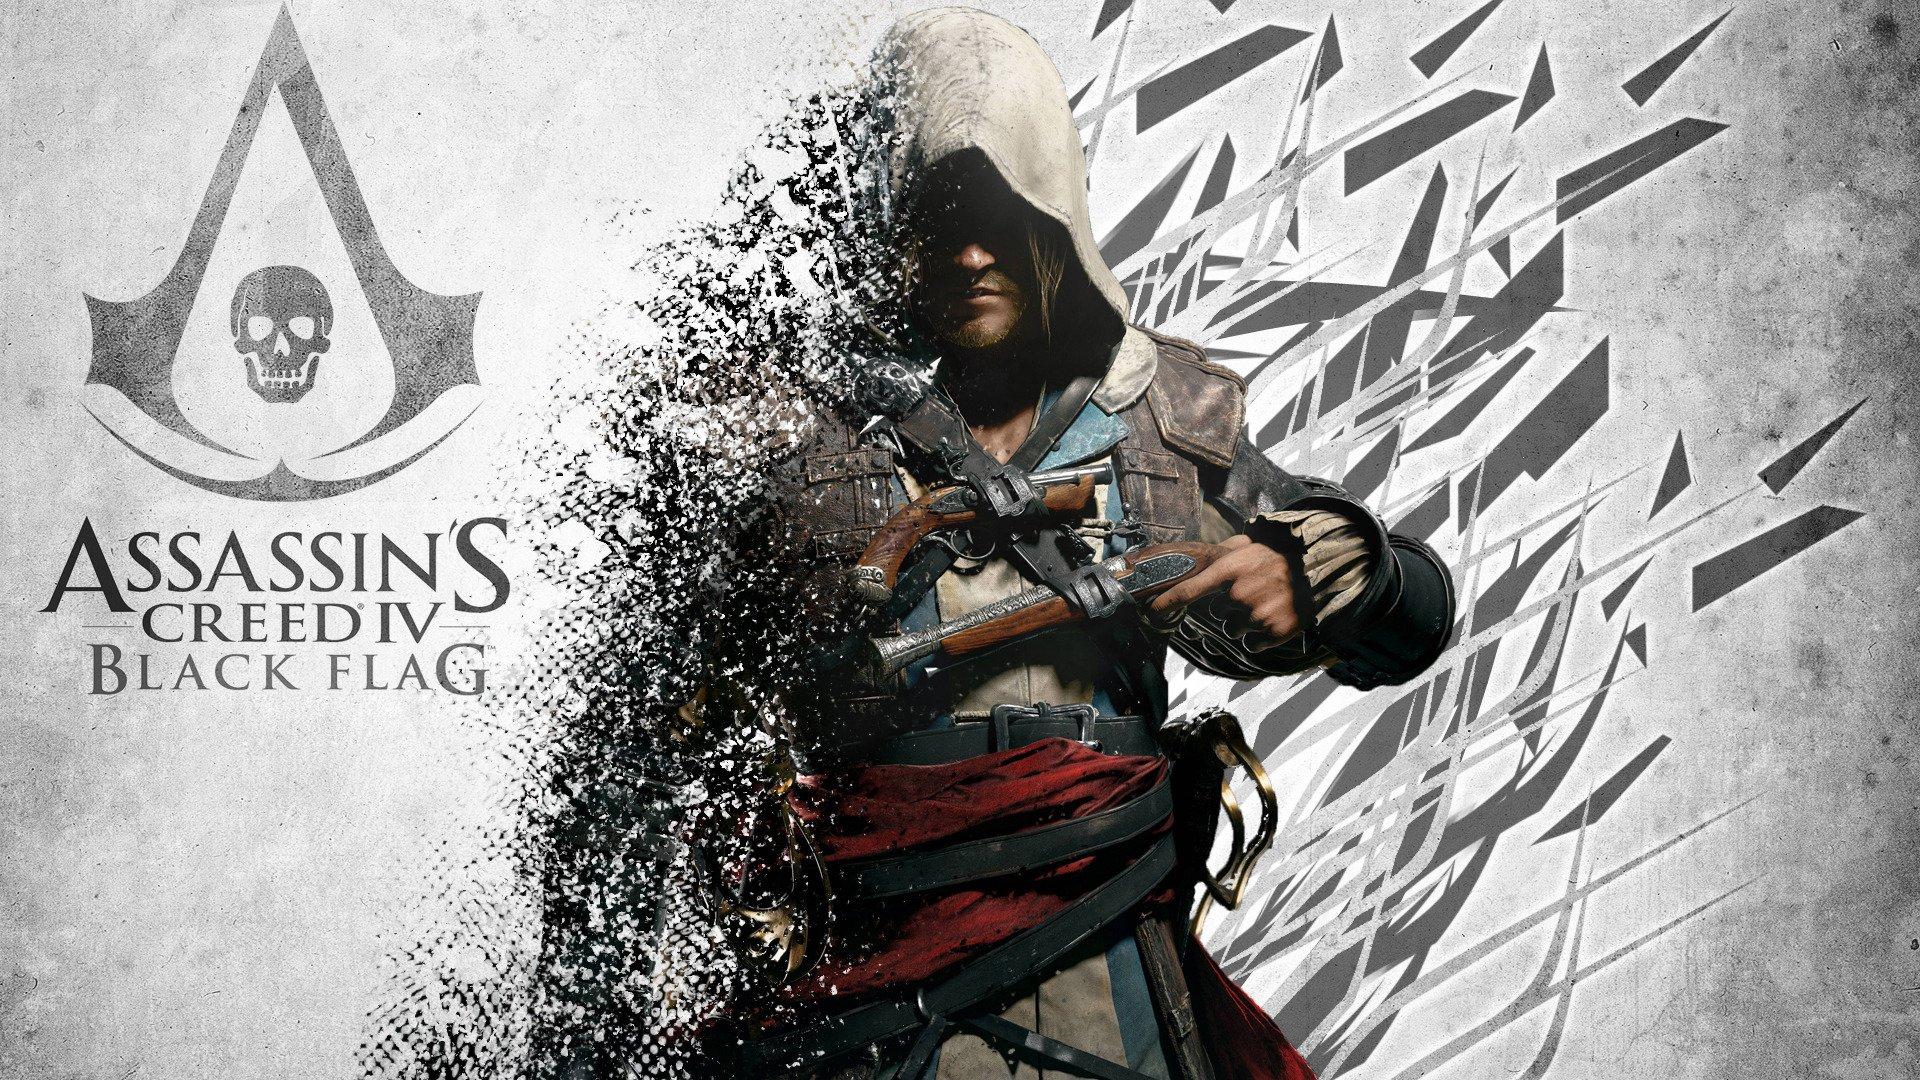 assassins creed black flag wallpaper 4k